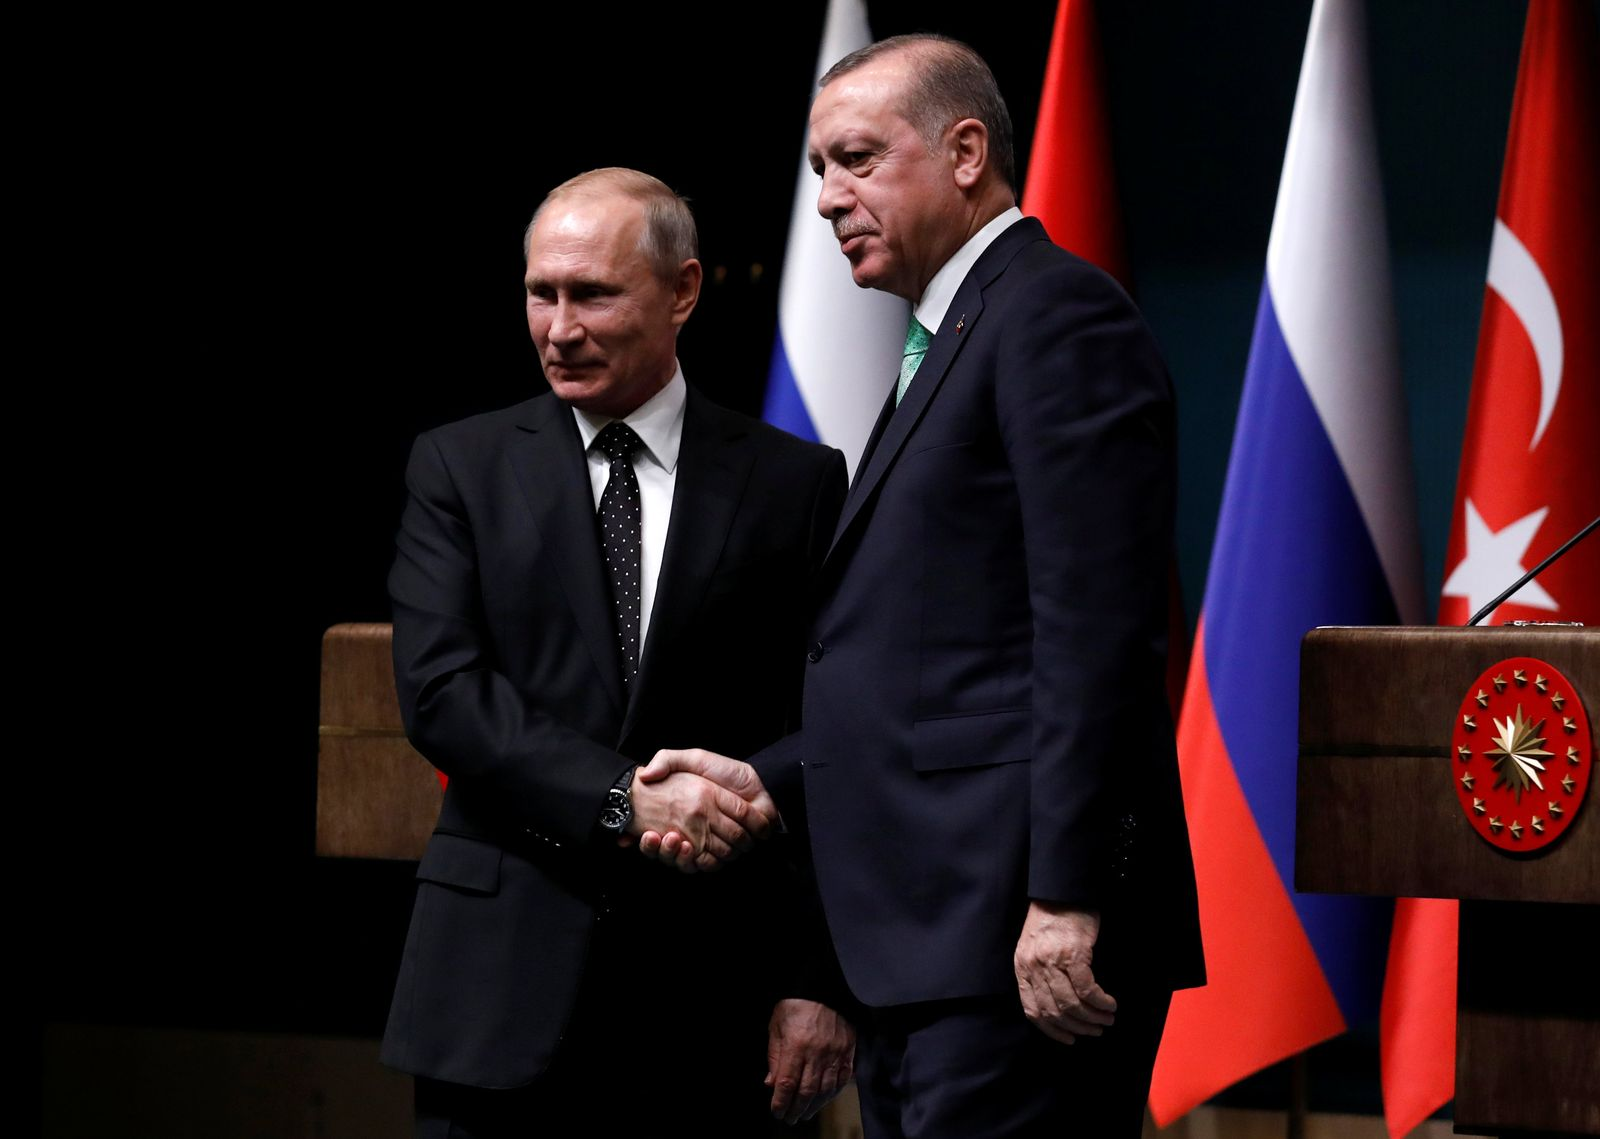 Wladimir Putin Erdogan